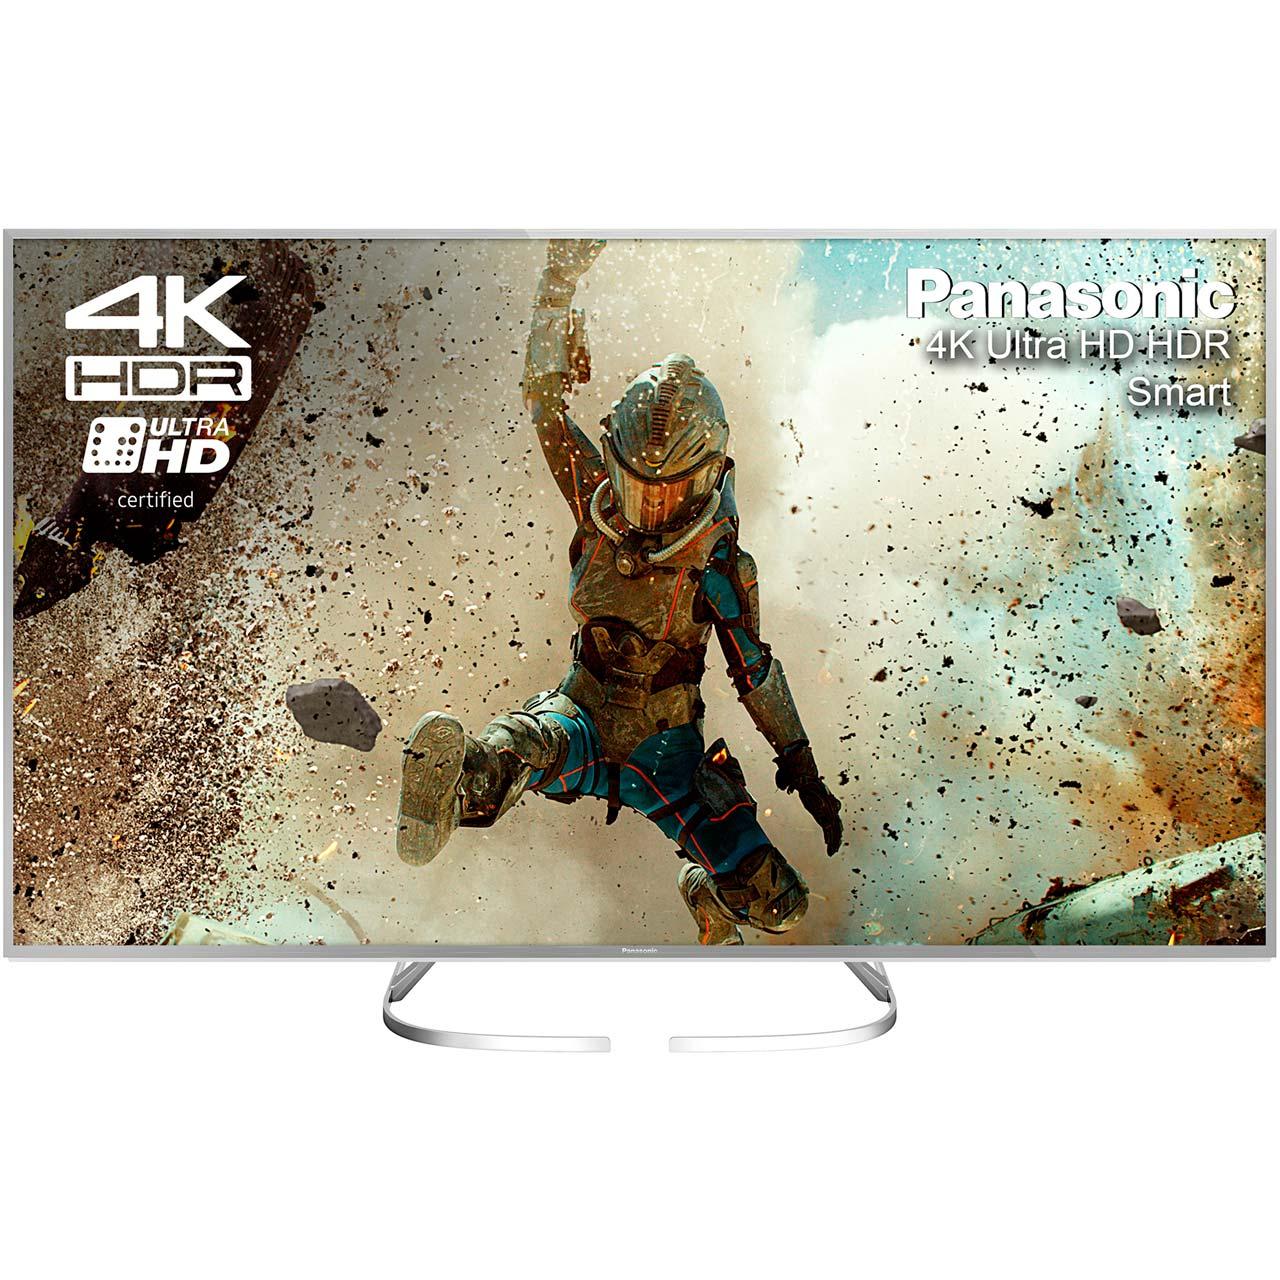 "Panasonic TX-50EX700B 50"" 4K HDR TV - Silver ( 6 Payments of £83  0 % APR ) £499 @ AO.com"